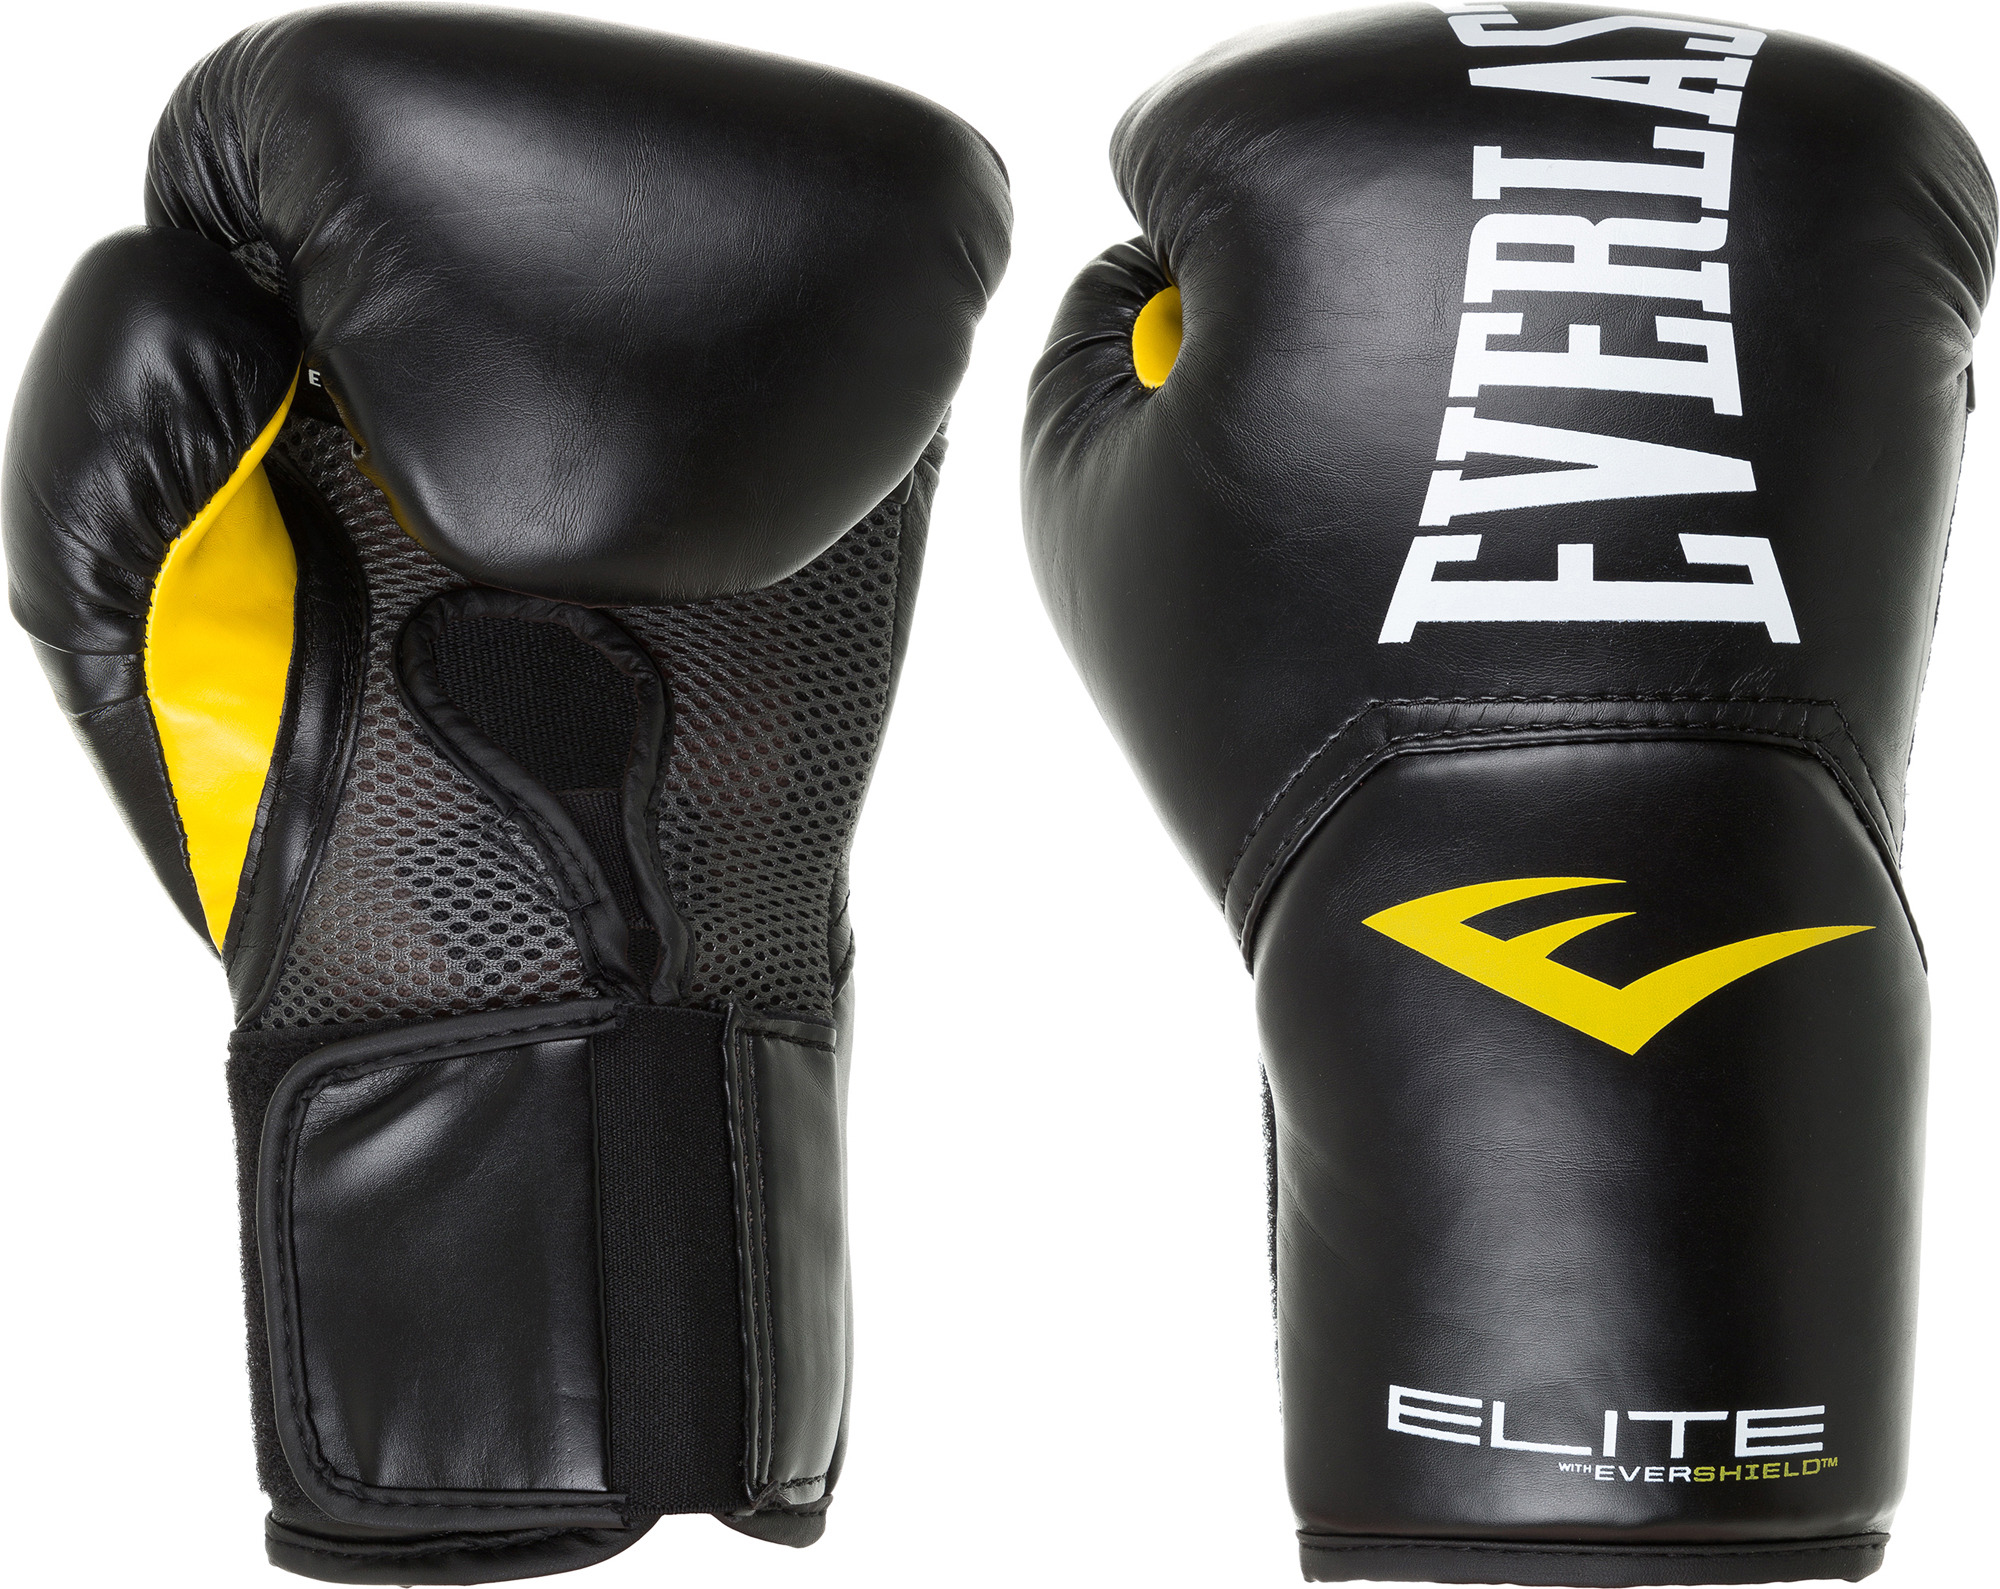 цена на Everlast Перчатки боксерские Everlast Elite Pro style, размер 8